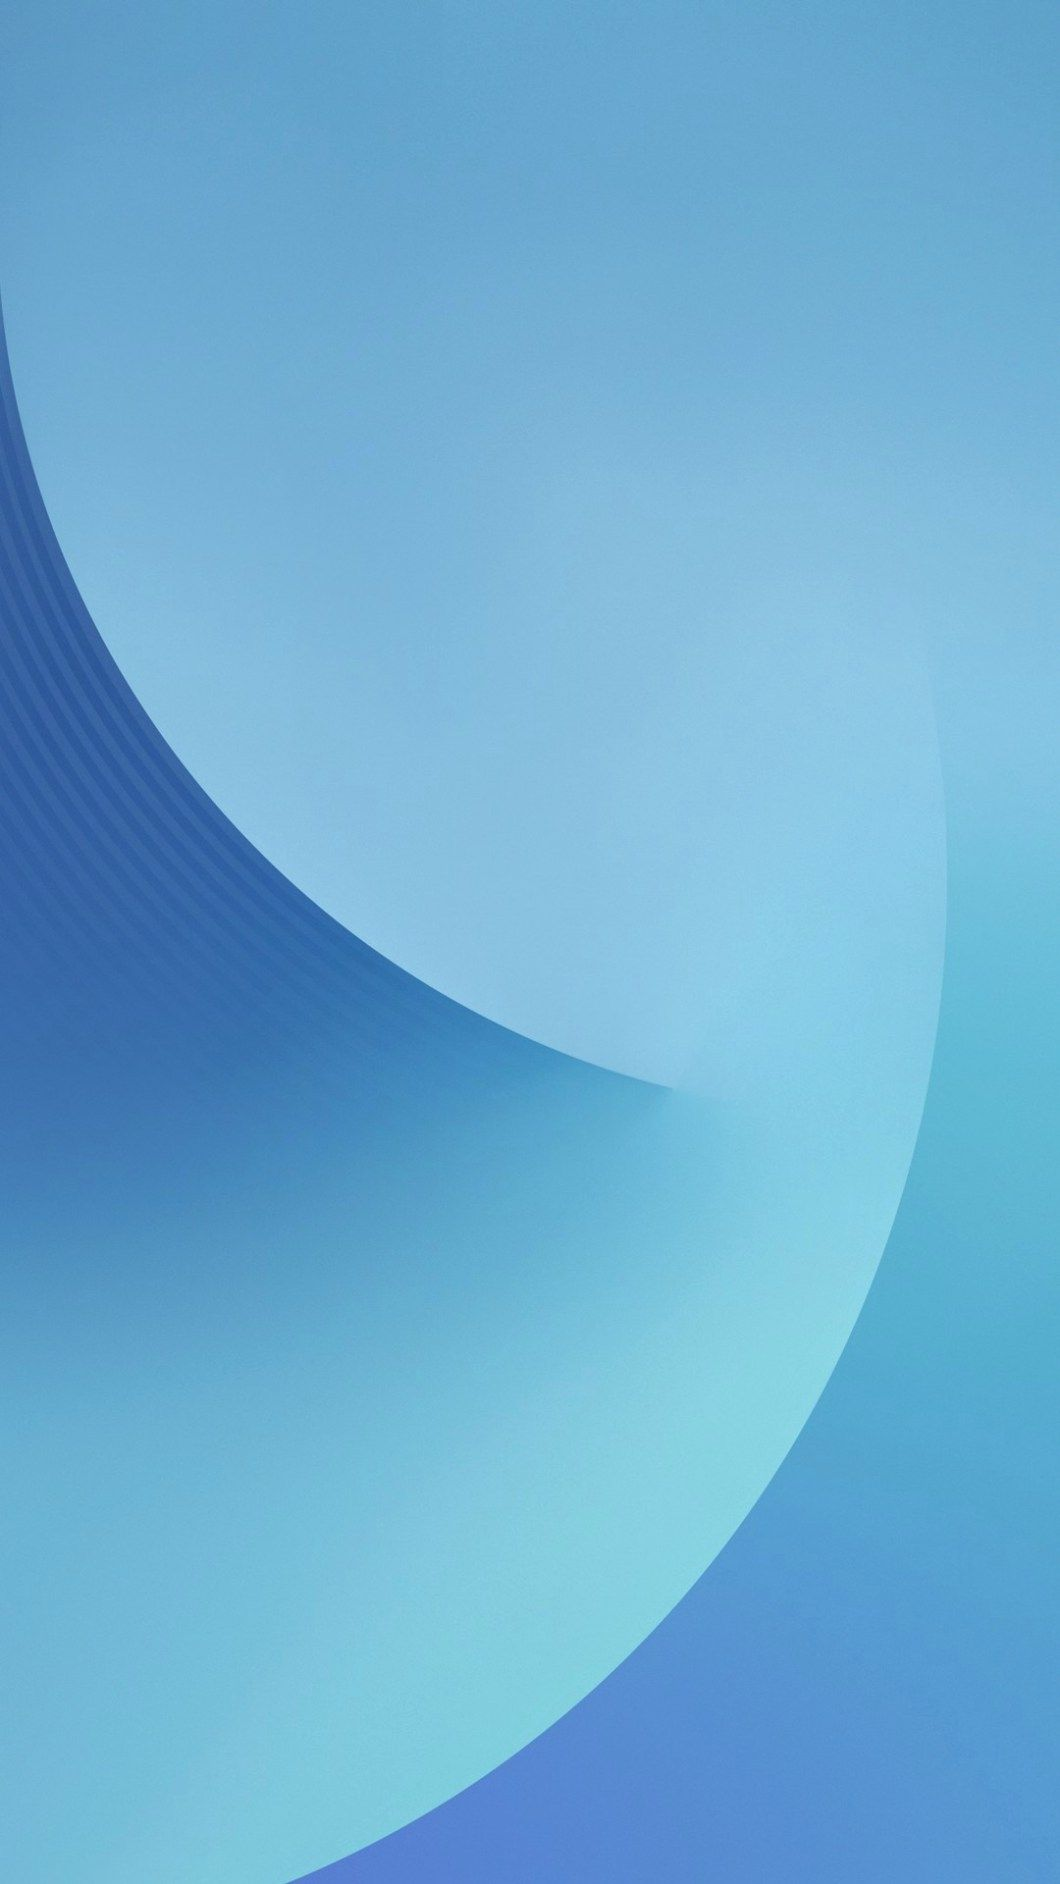 Samsung J7 Wallpapers Top Free Samsung J7 Backgrounds Wallpaperaccess